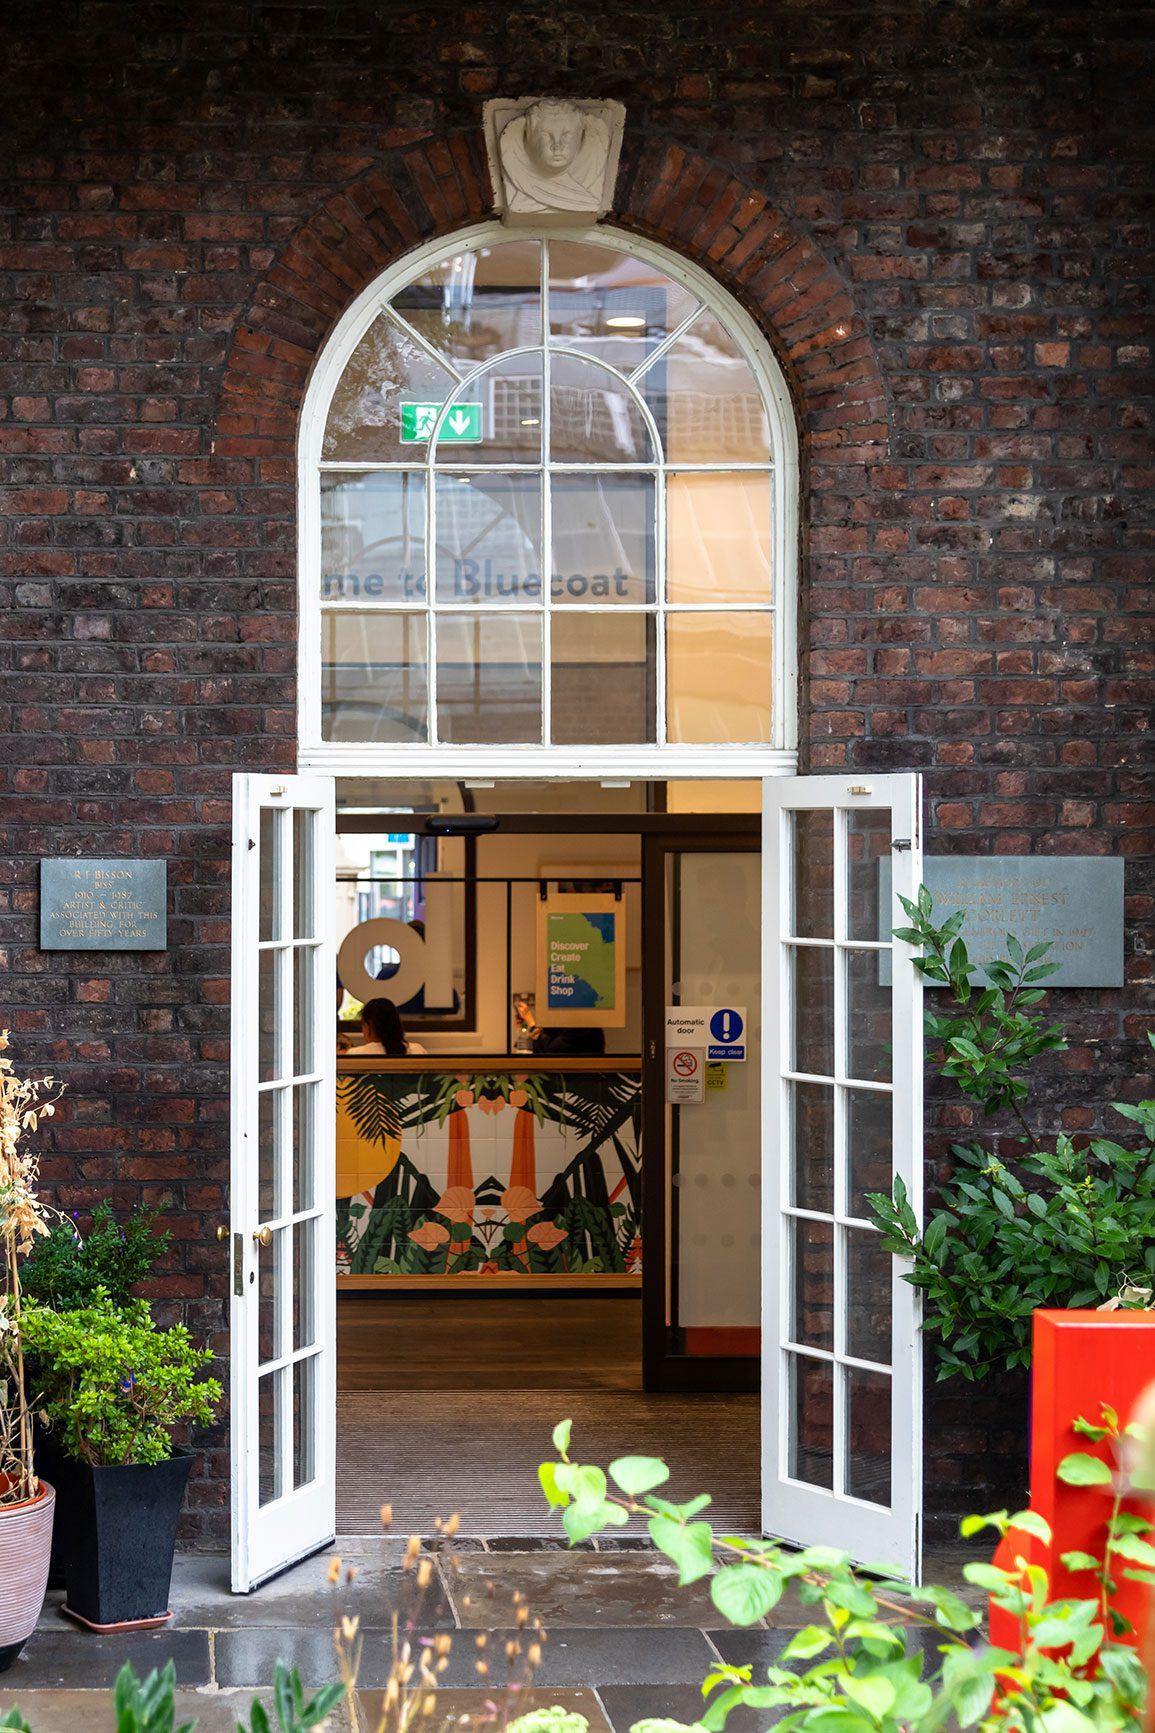 Bluecoat Arts Centre Liverpool Architectural Emporium Hub Entrance. Photo: Matthew Westgate